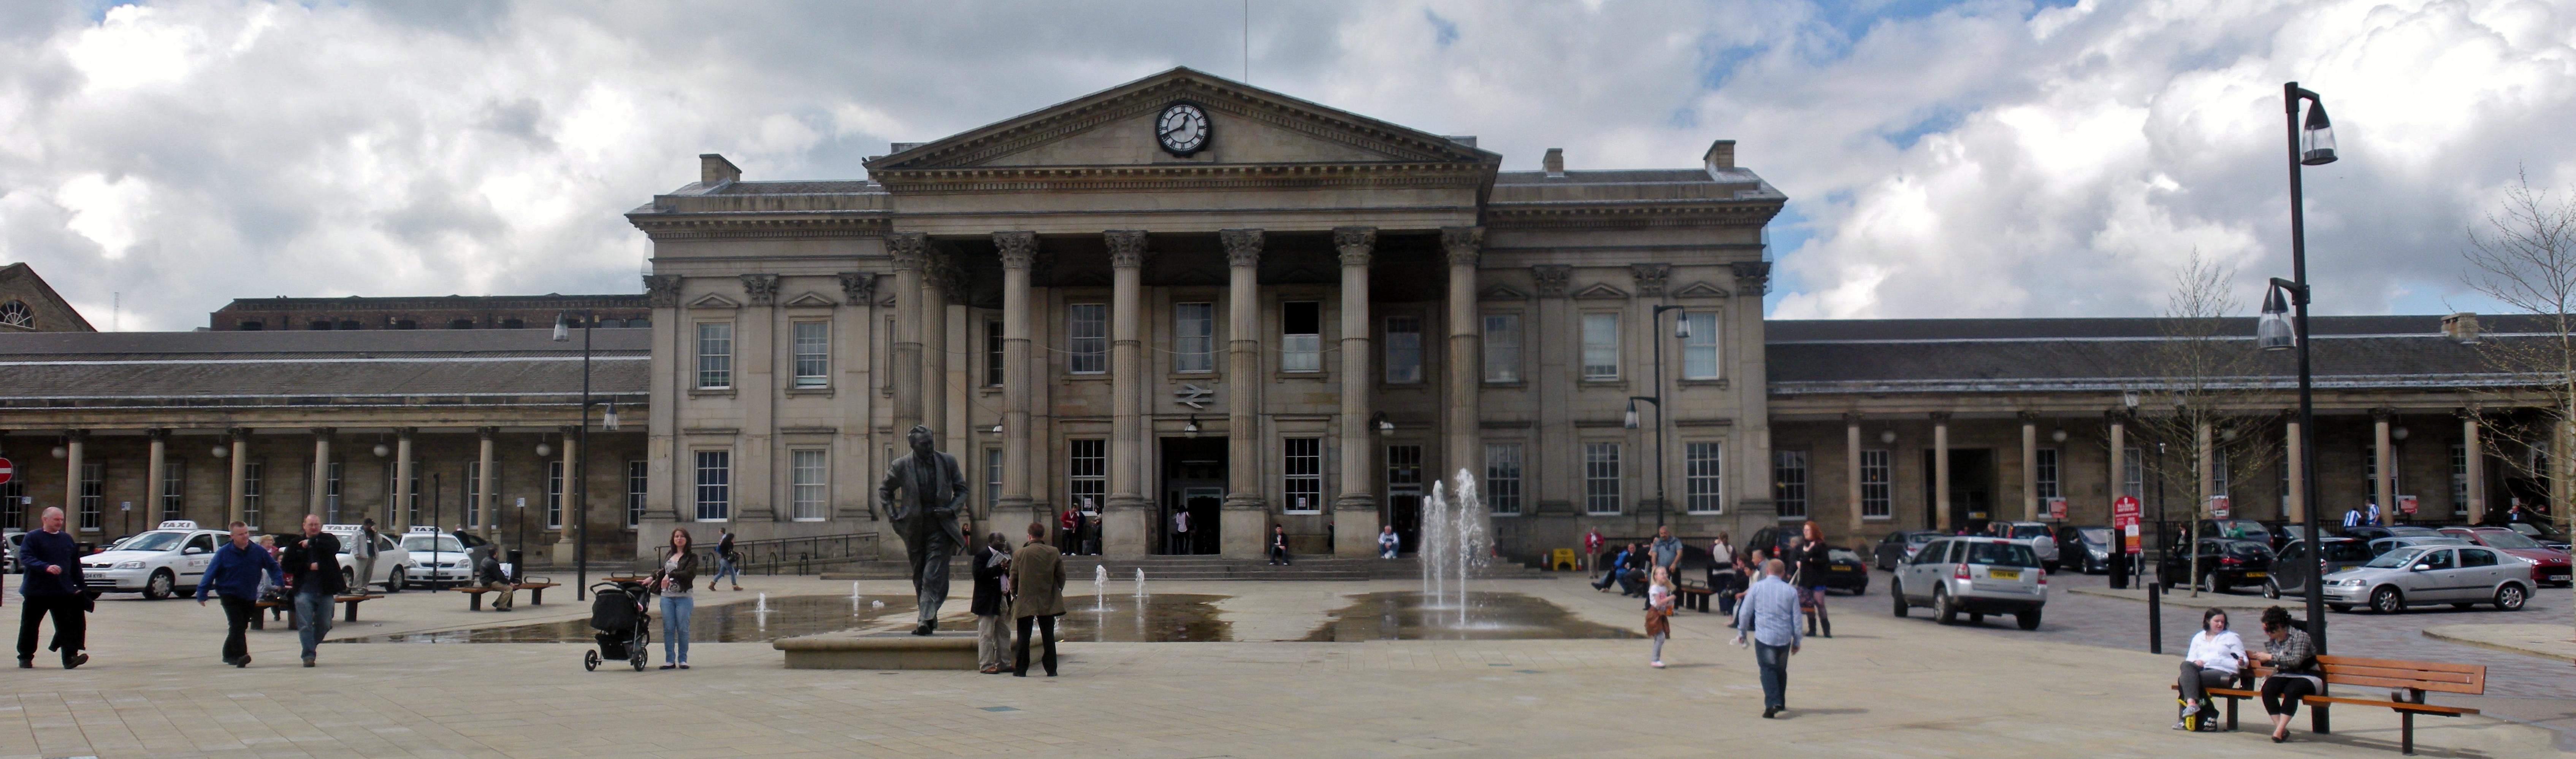 Leeds Railway Station Hotels